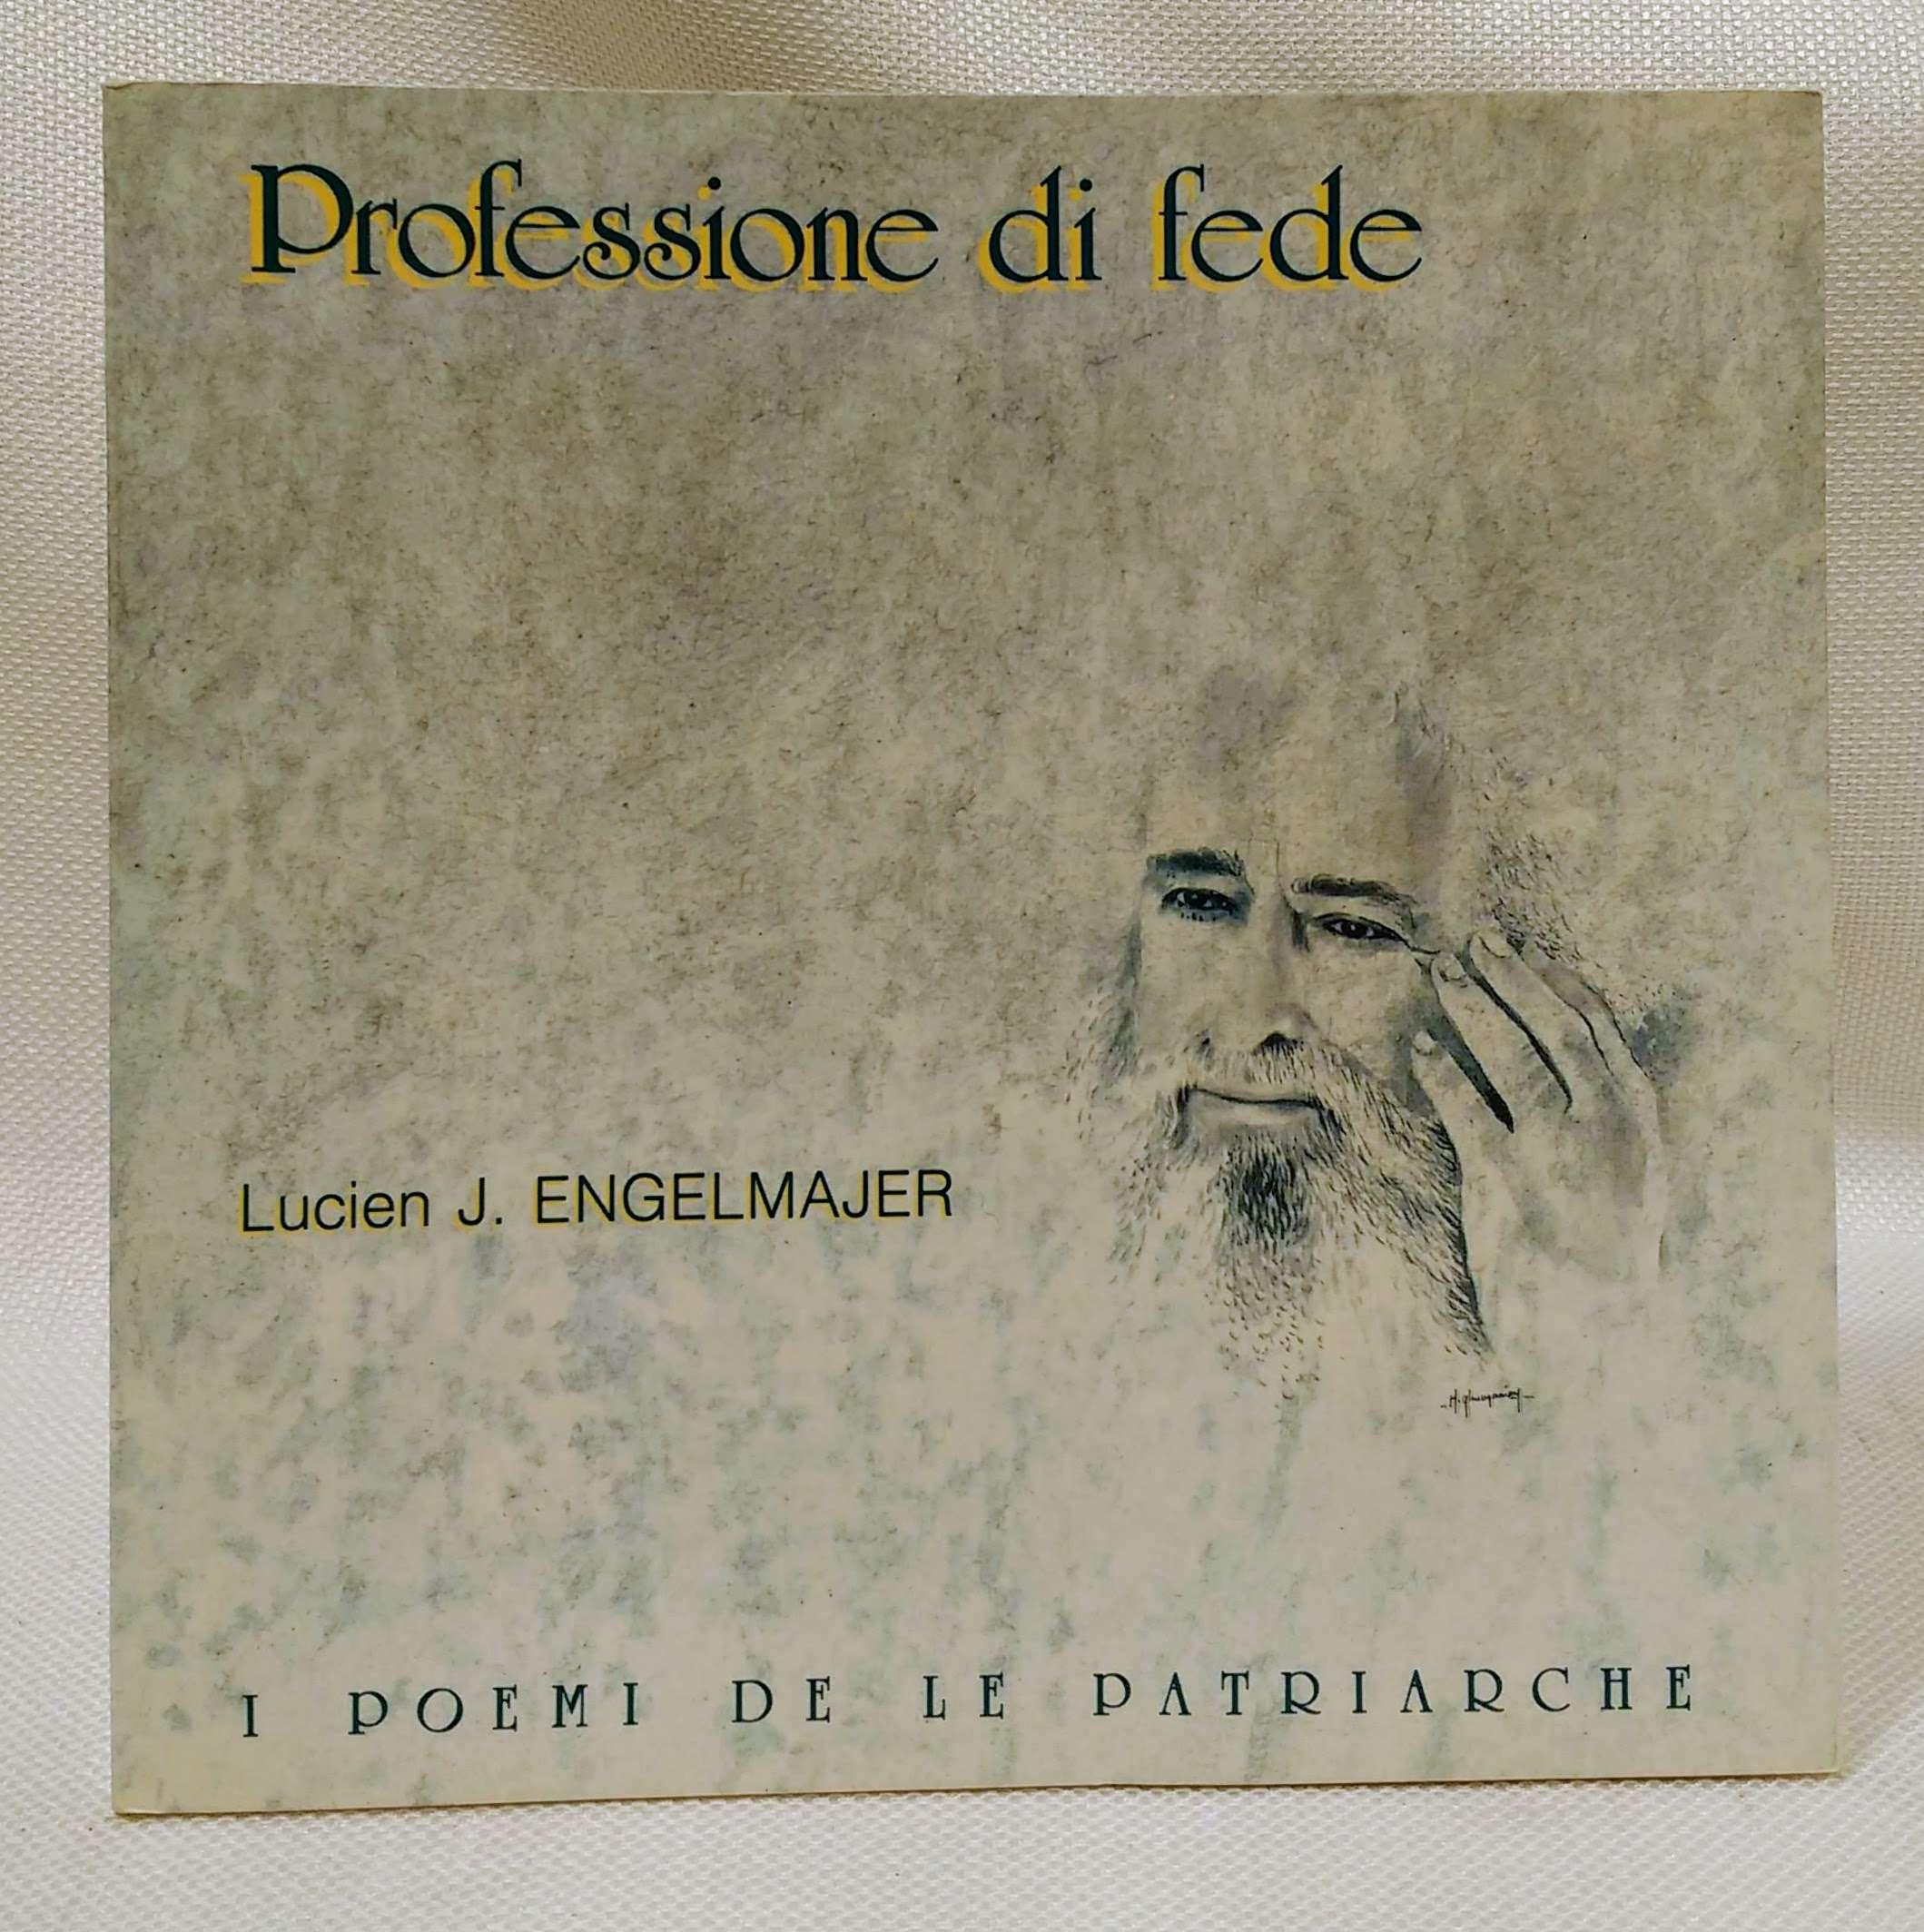 Professione di fede, Engelmajer, Lucien J.